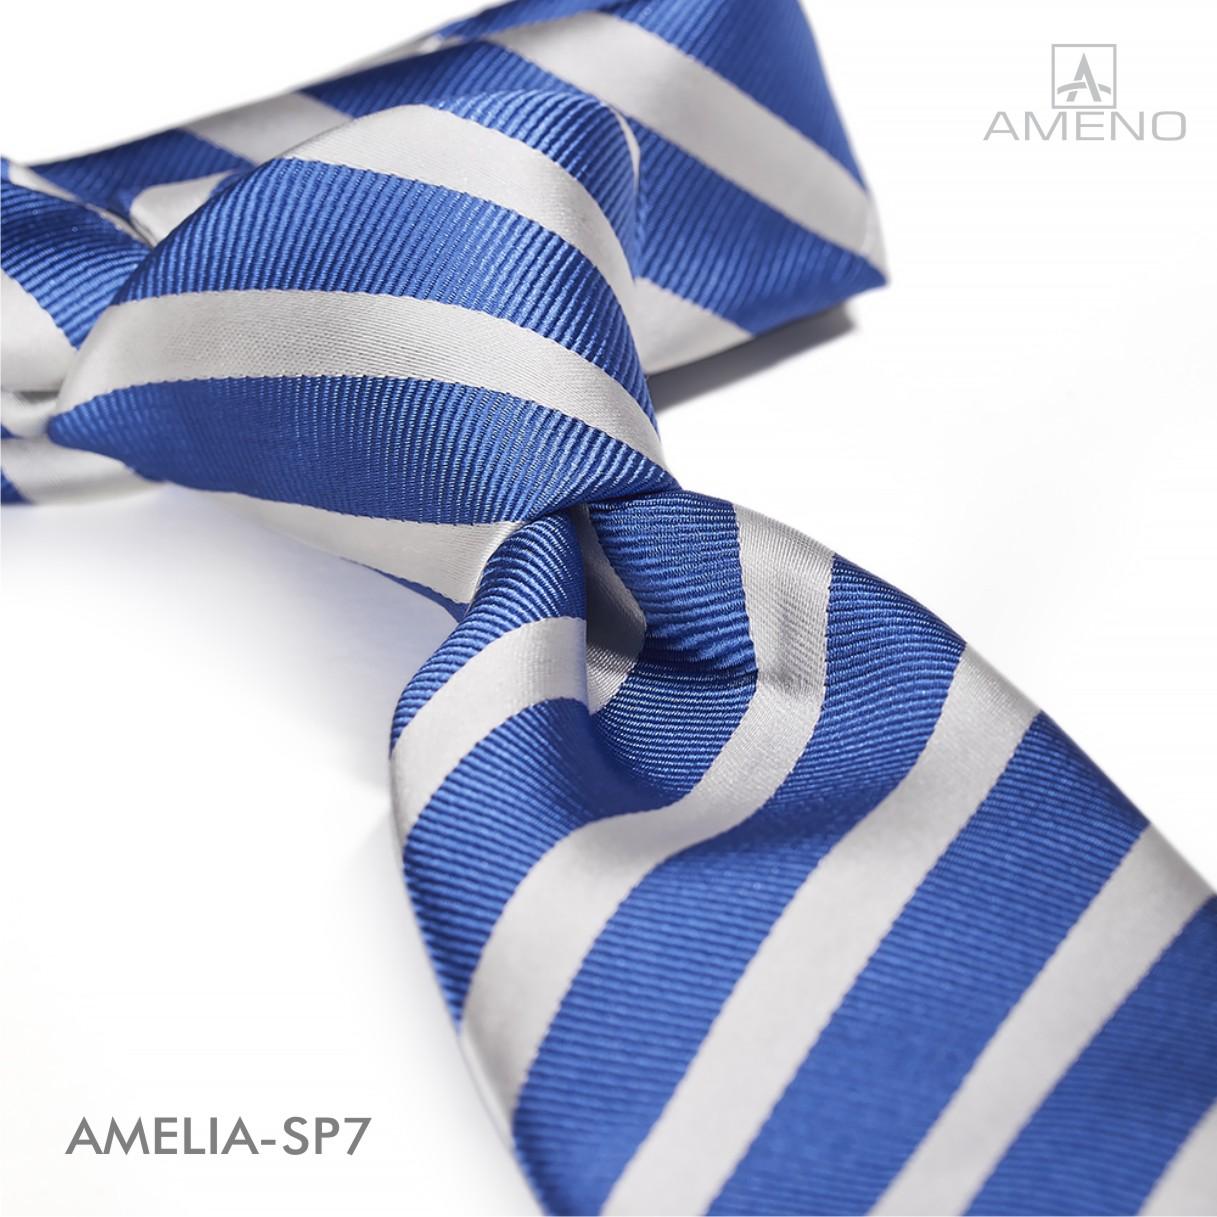 hvidt slips betydning